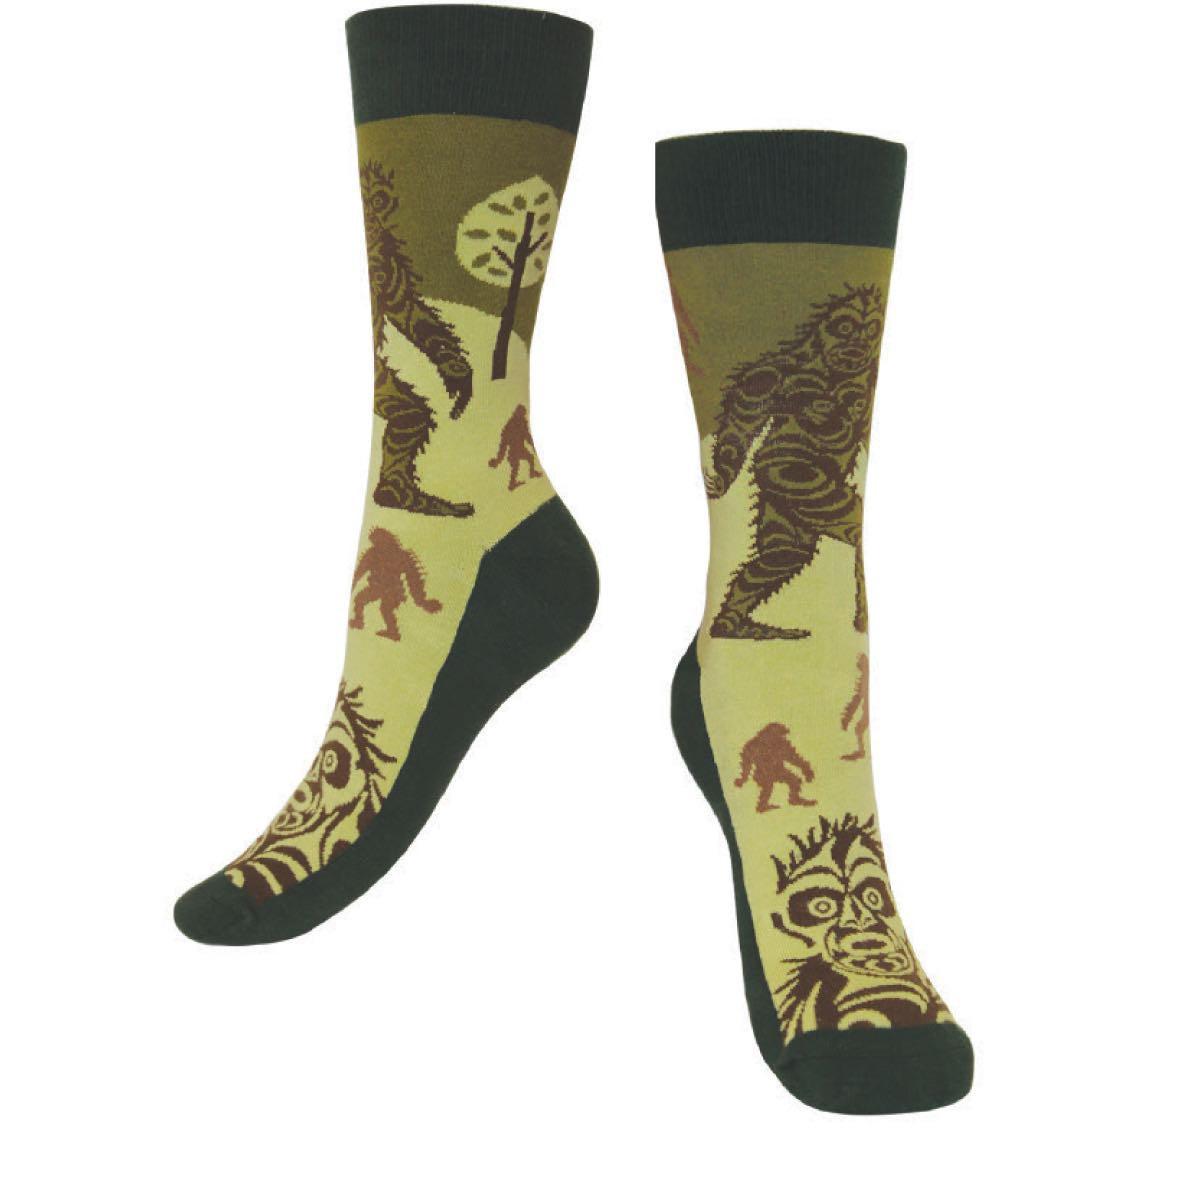 Art Socks - Sasquatch